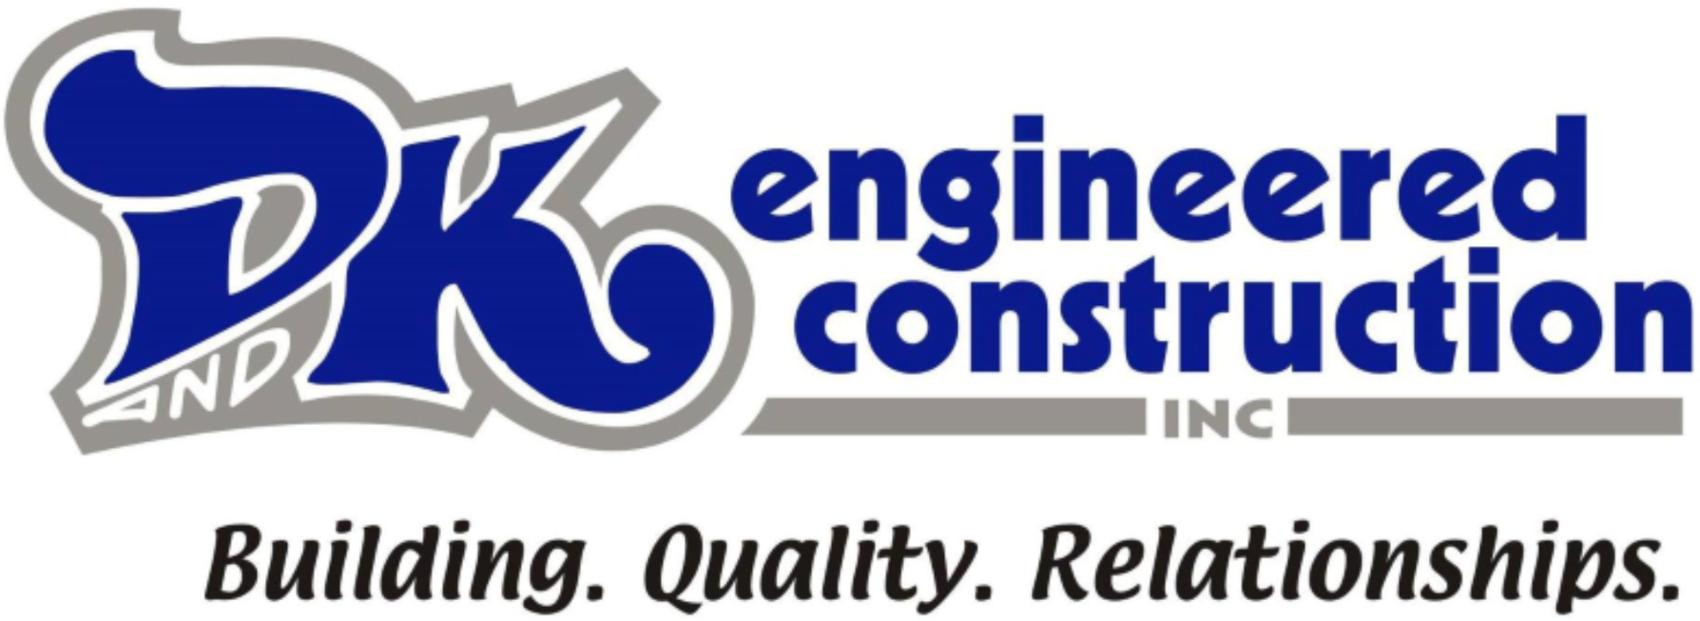 D&K Engineered Construction Logo